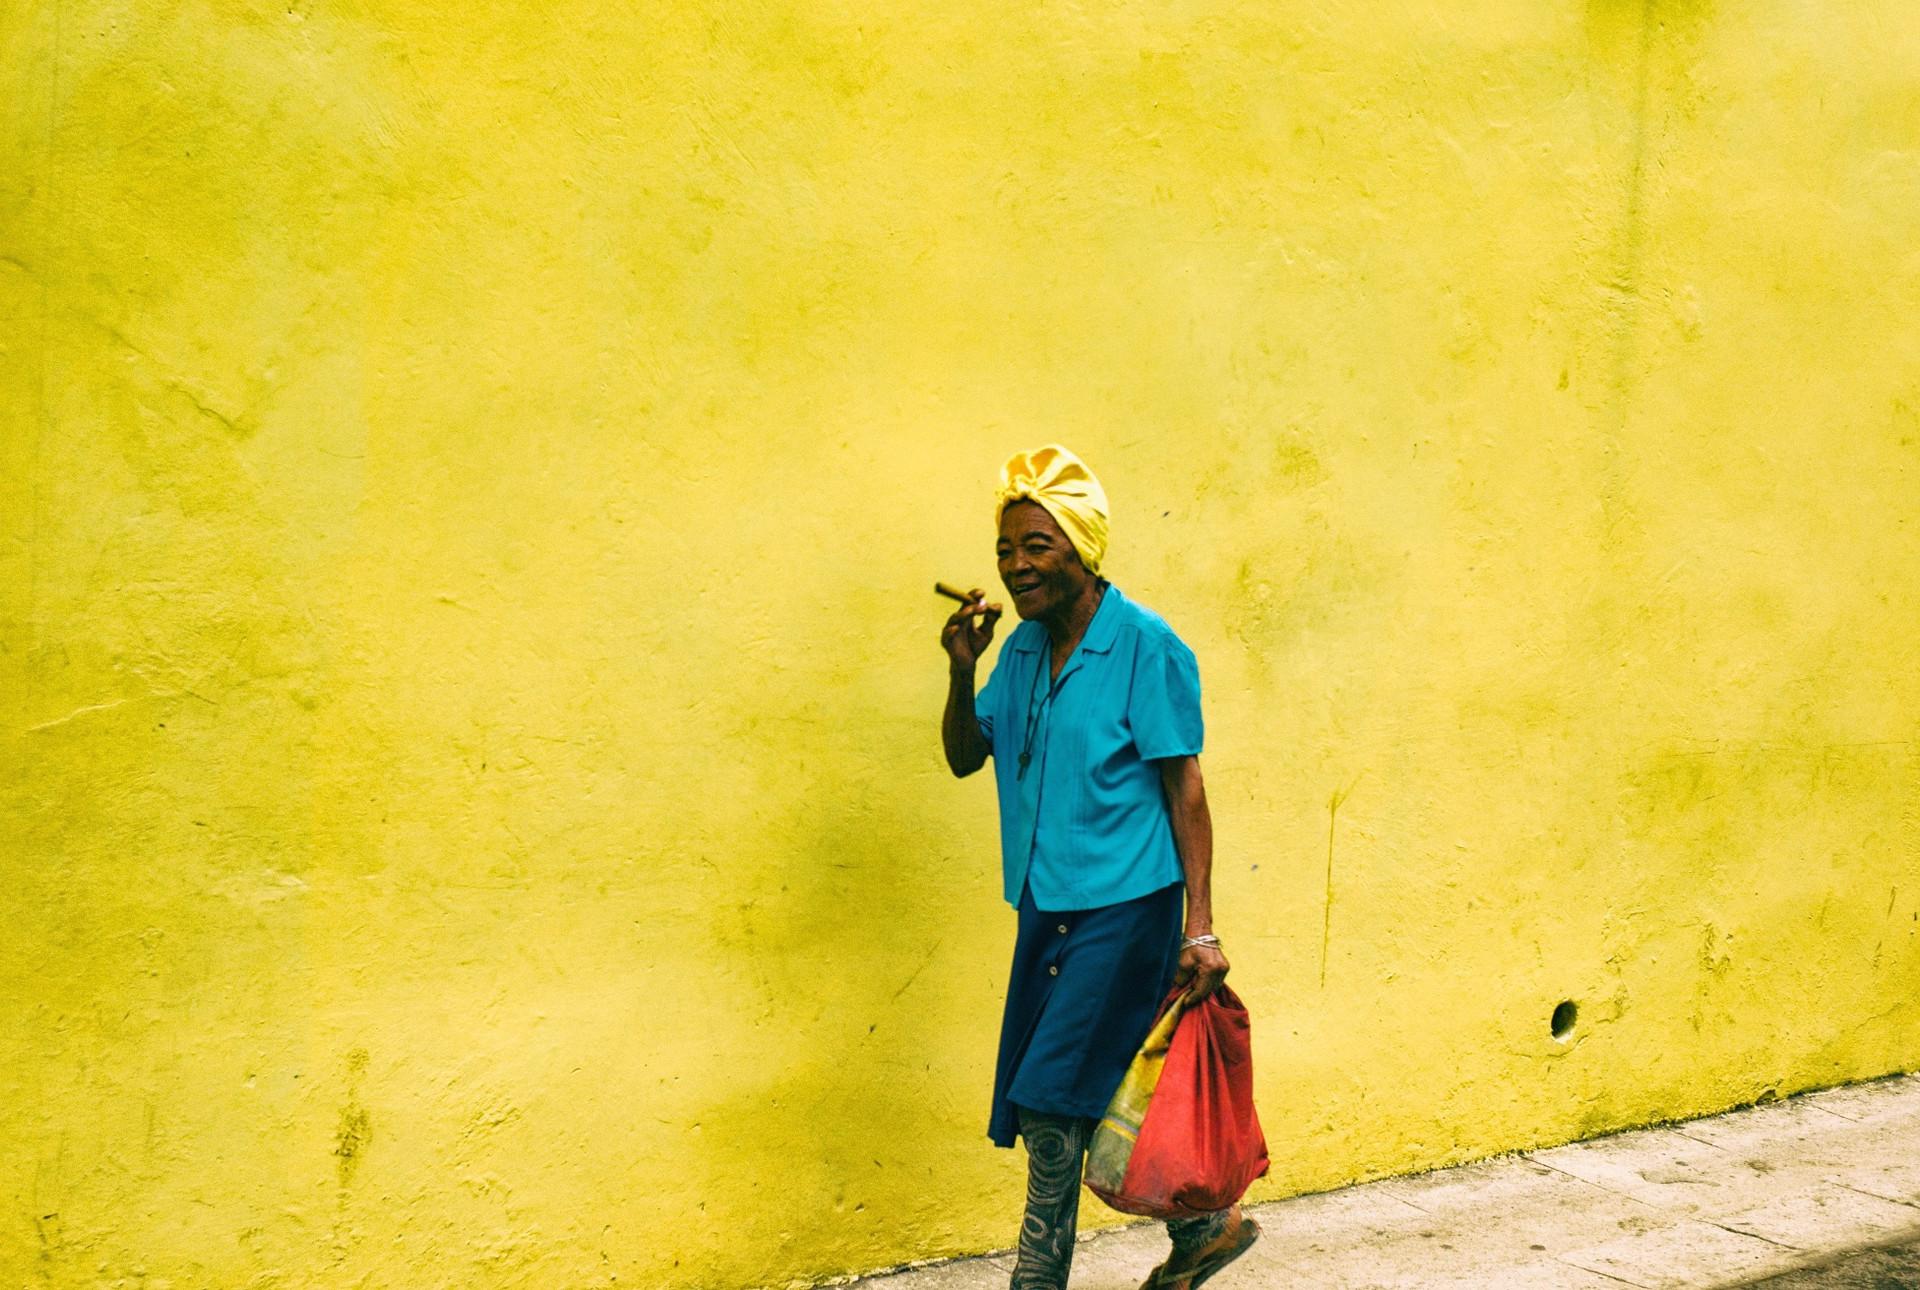 Lady with cigar, Havana